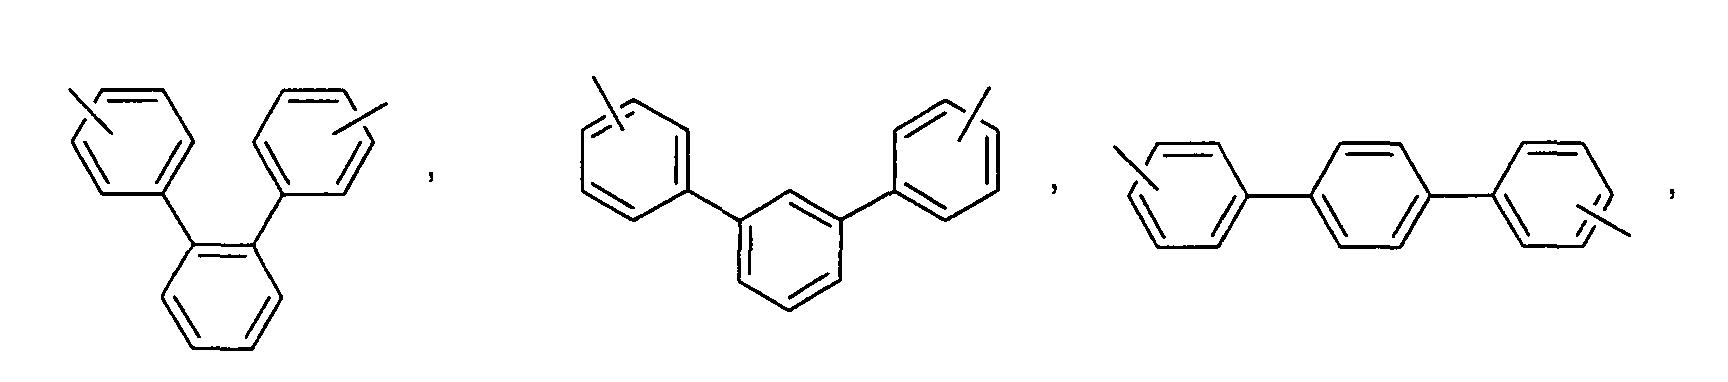 Figure 00250004